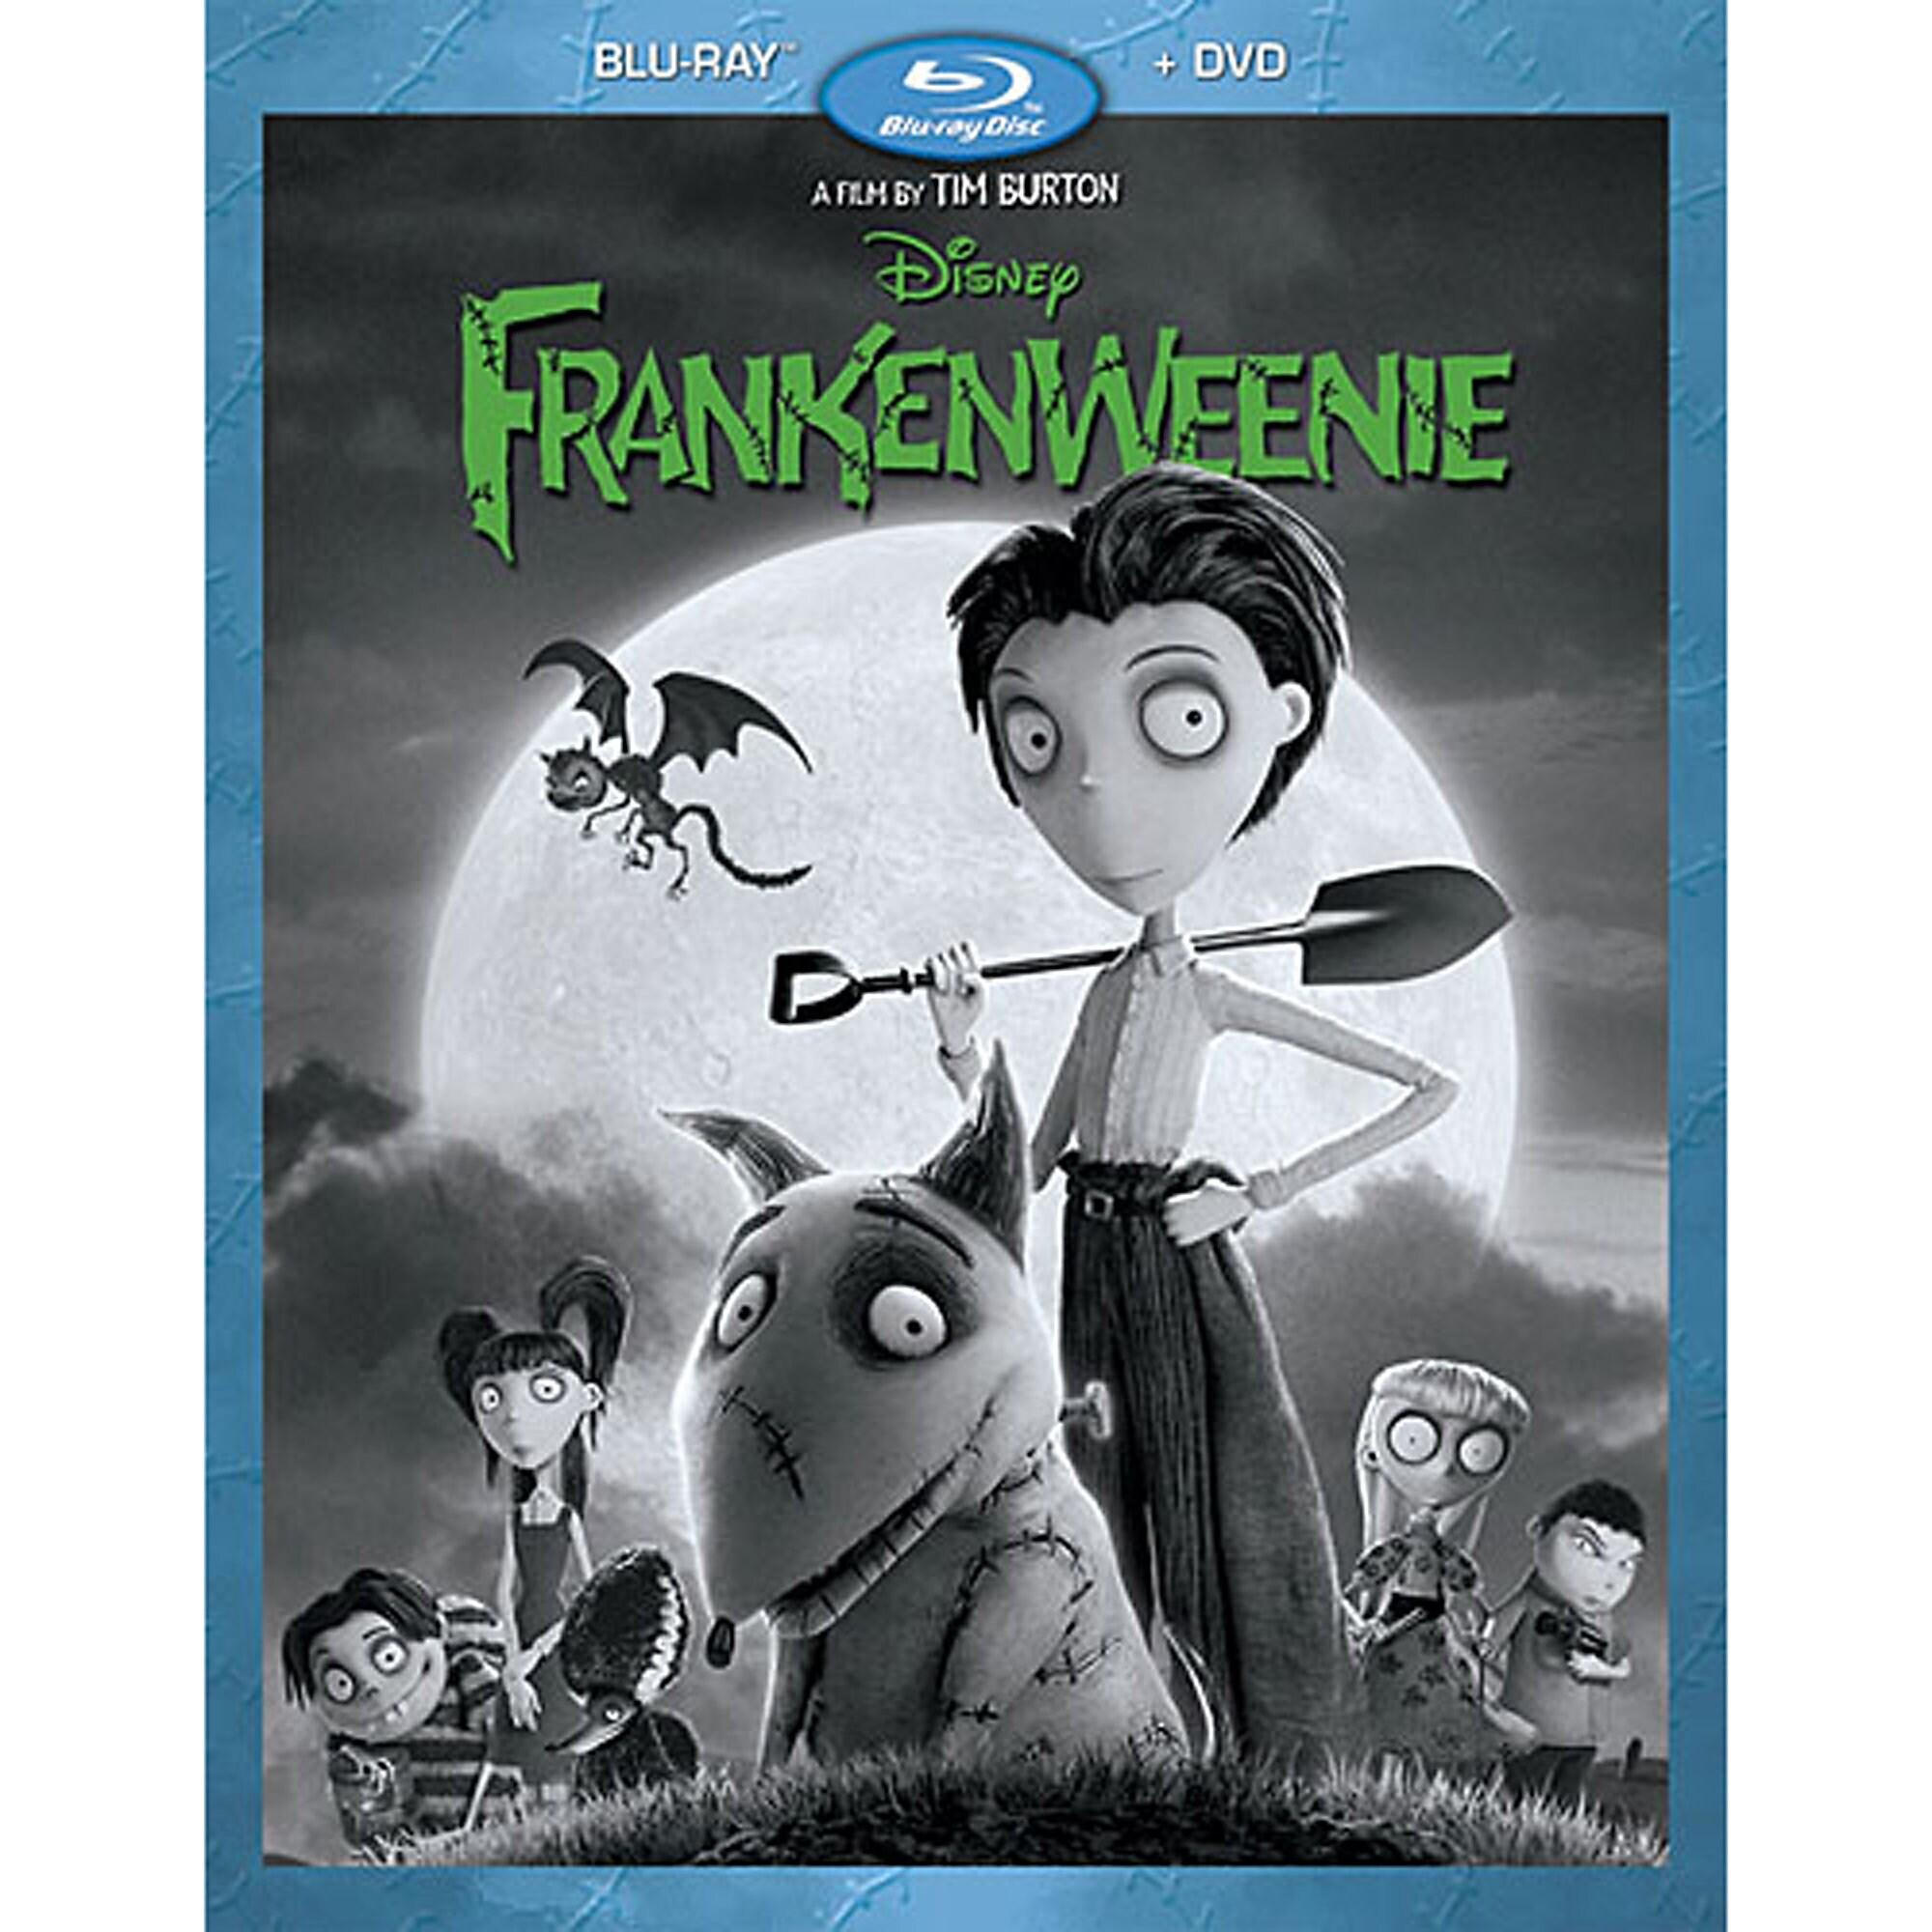 Frankenweenie Blu-ray and DVD Combo Pack